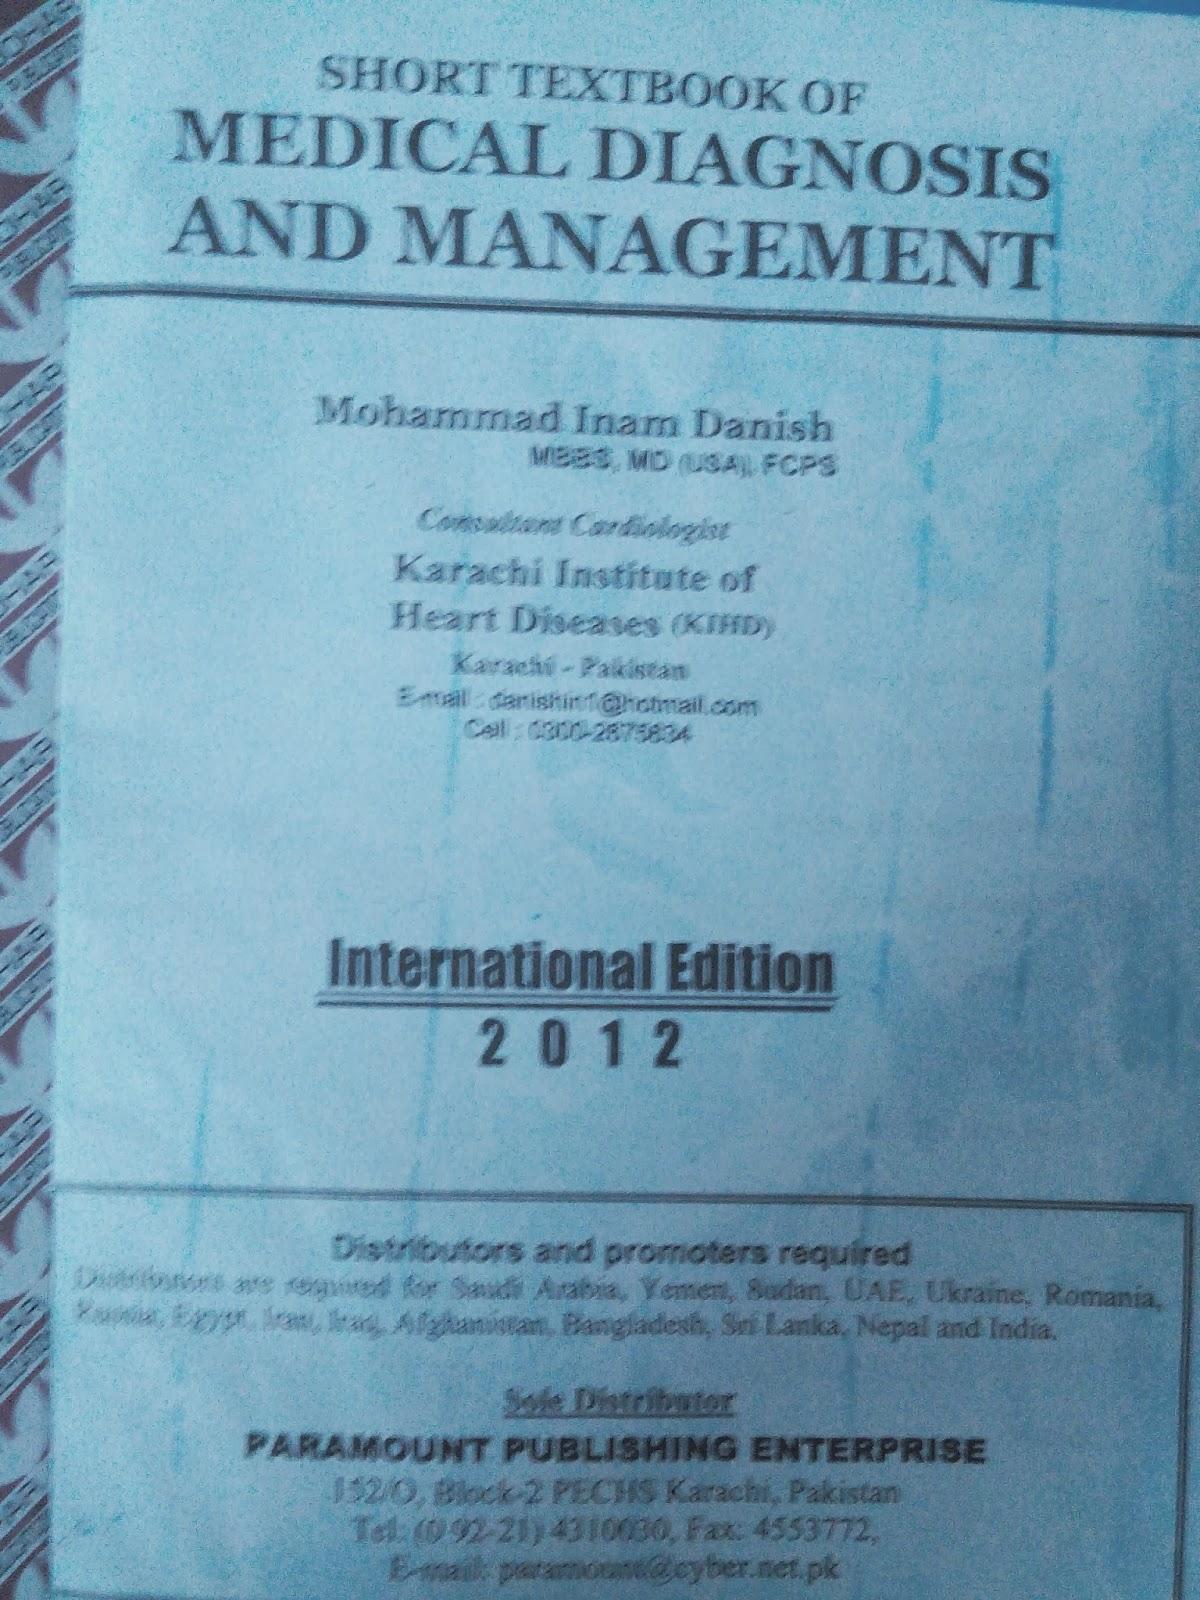 INAM DANISH MEDICINE PDF DOWNLOAD